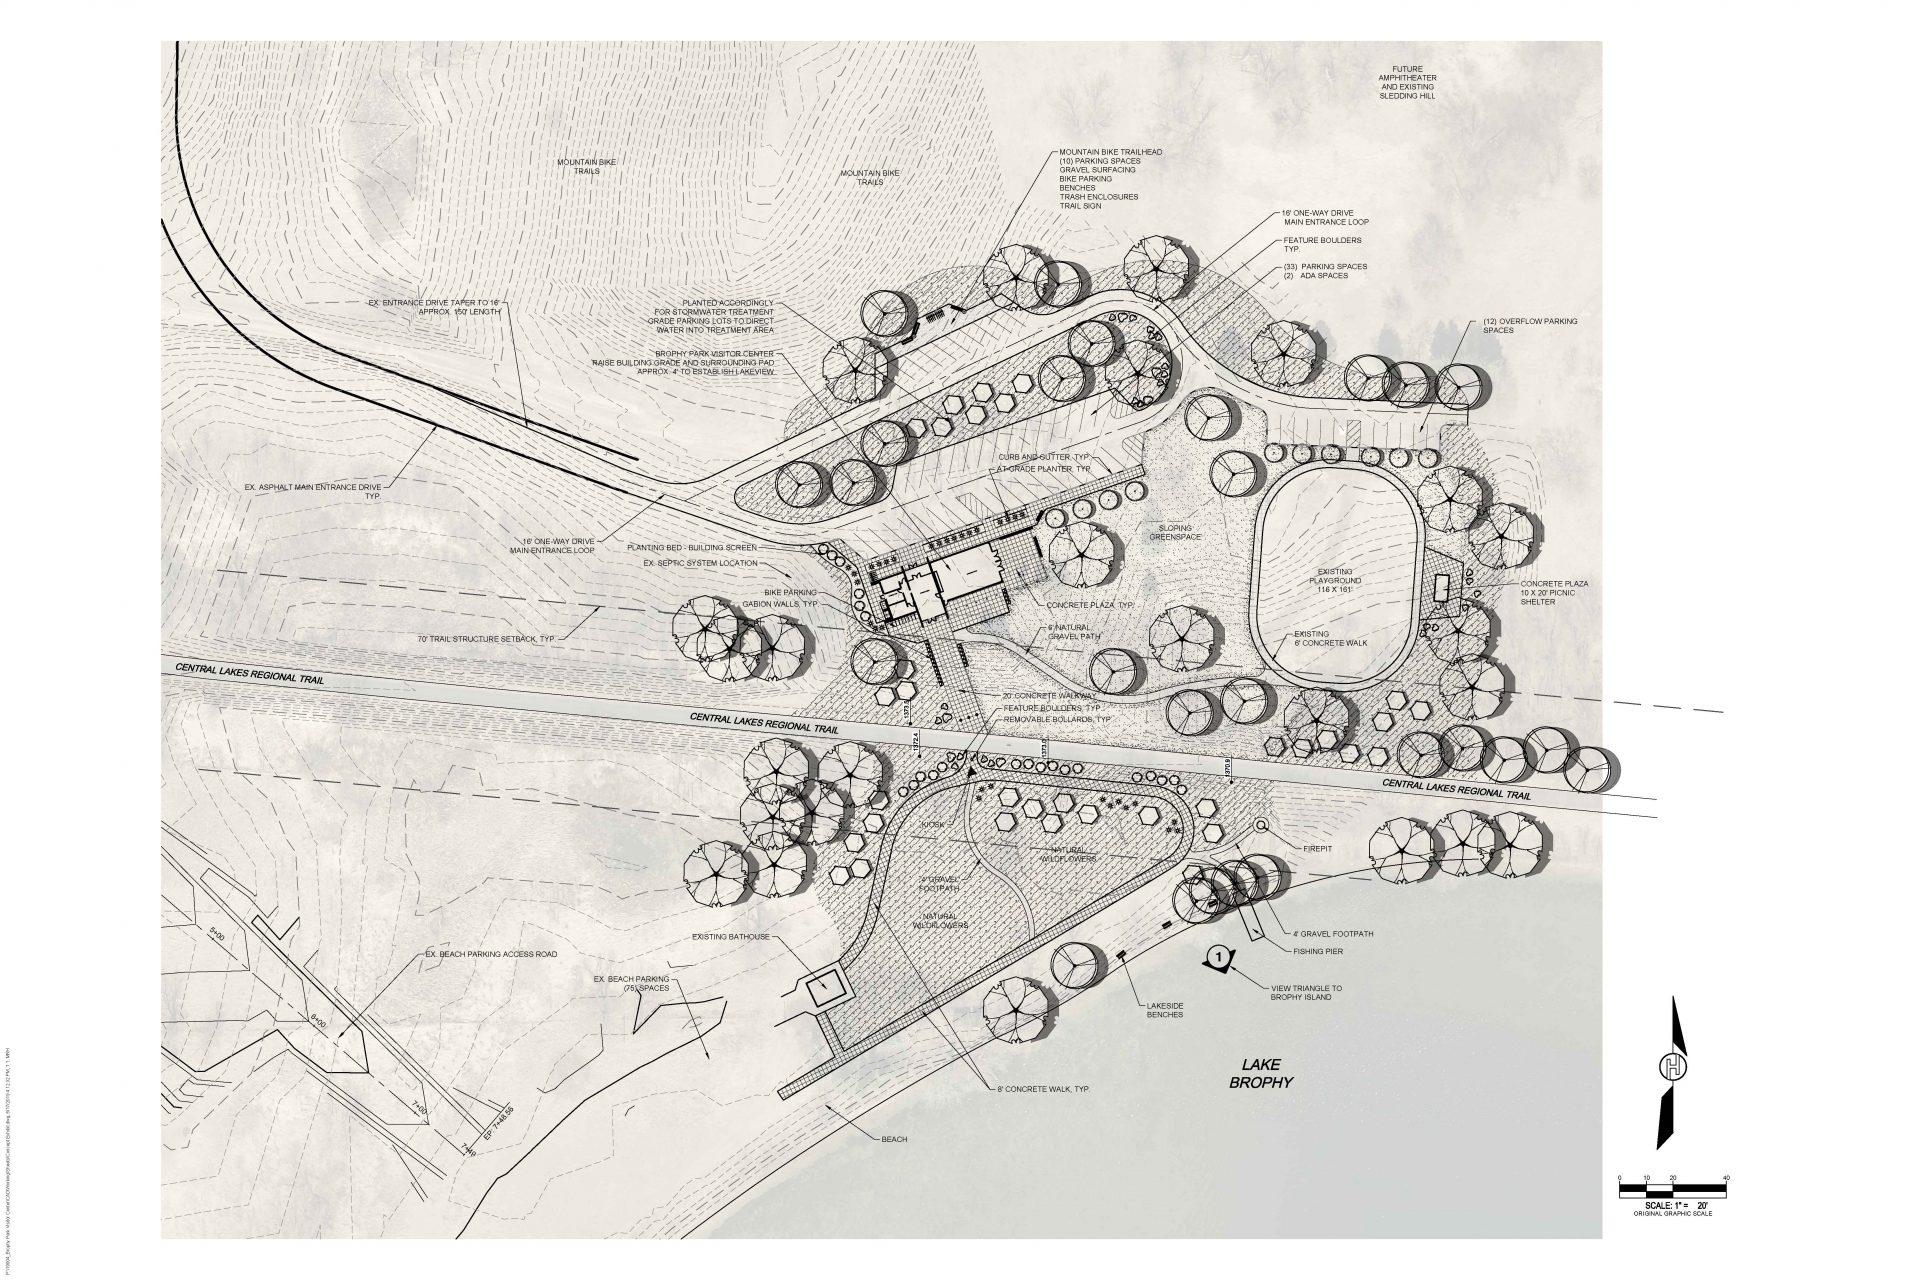 brophy park plans